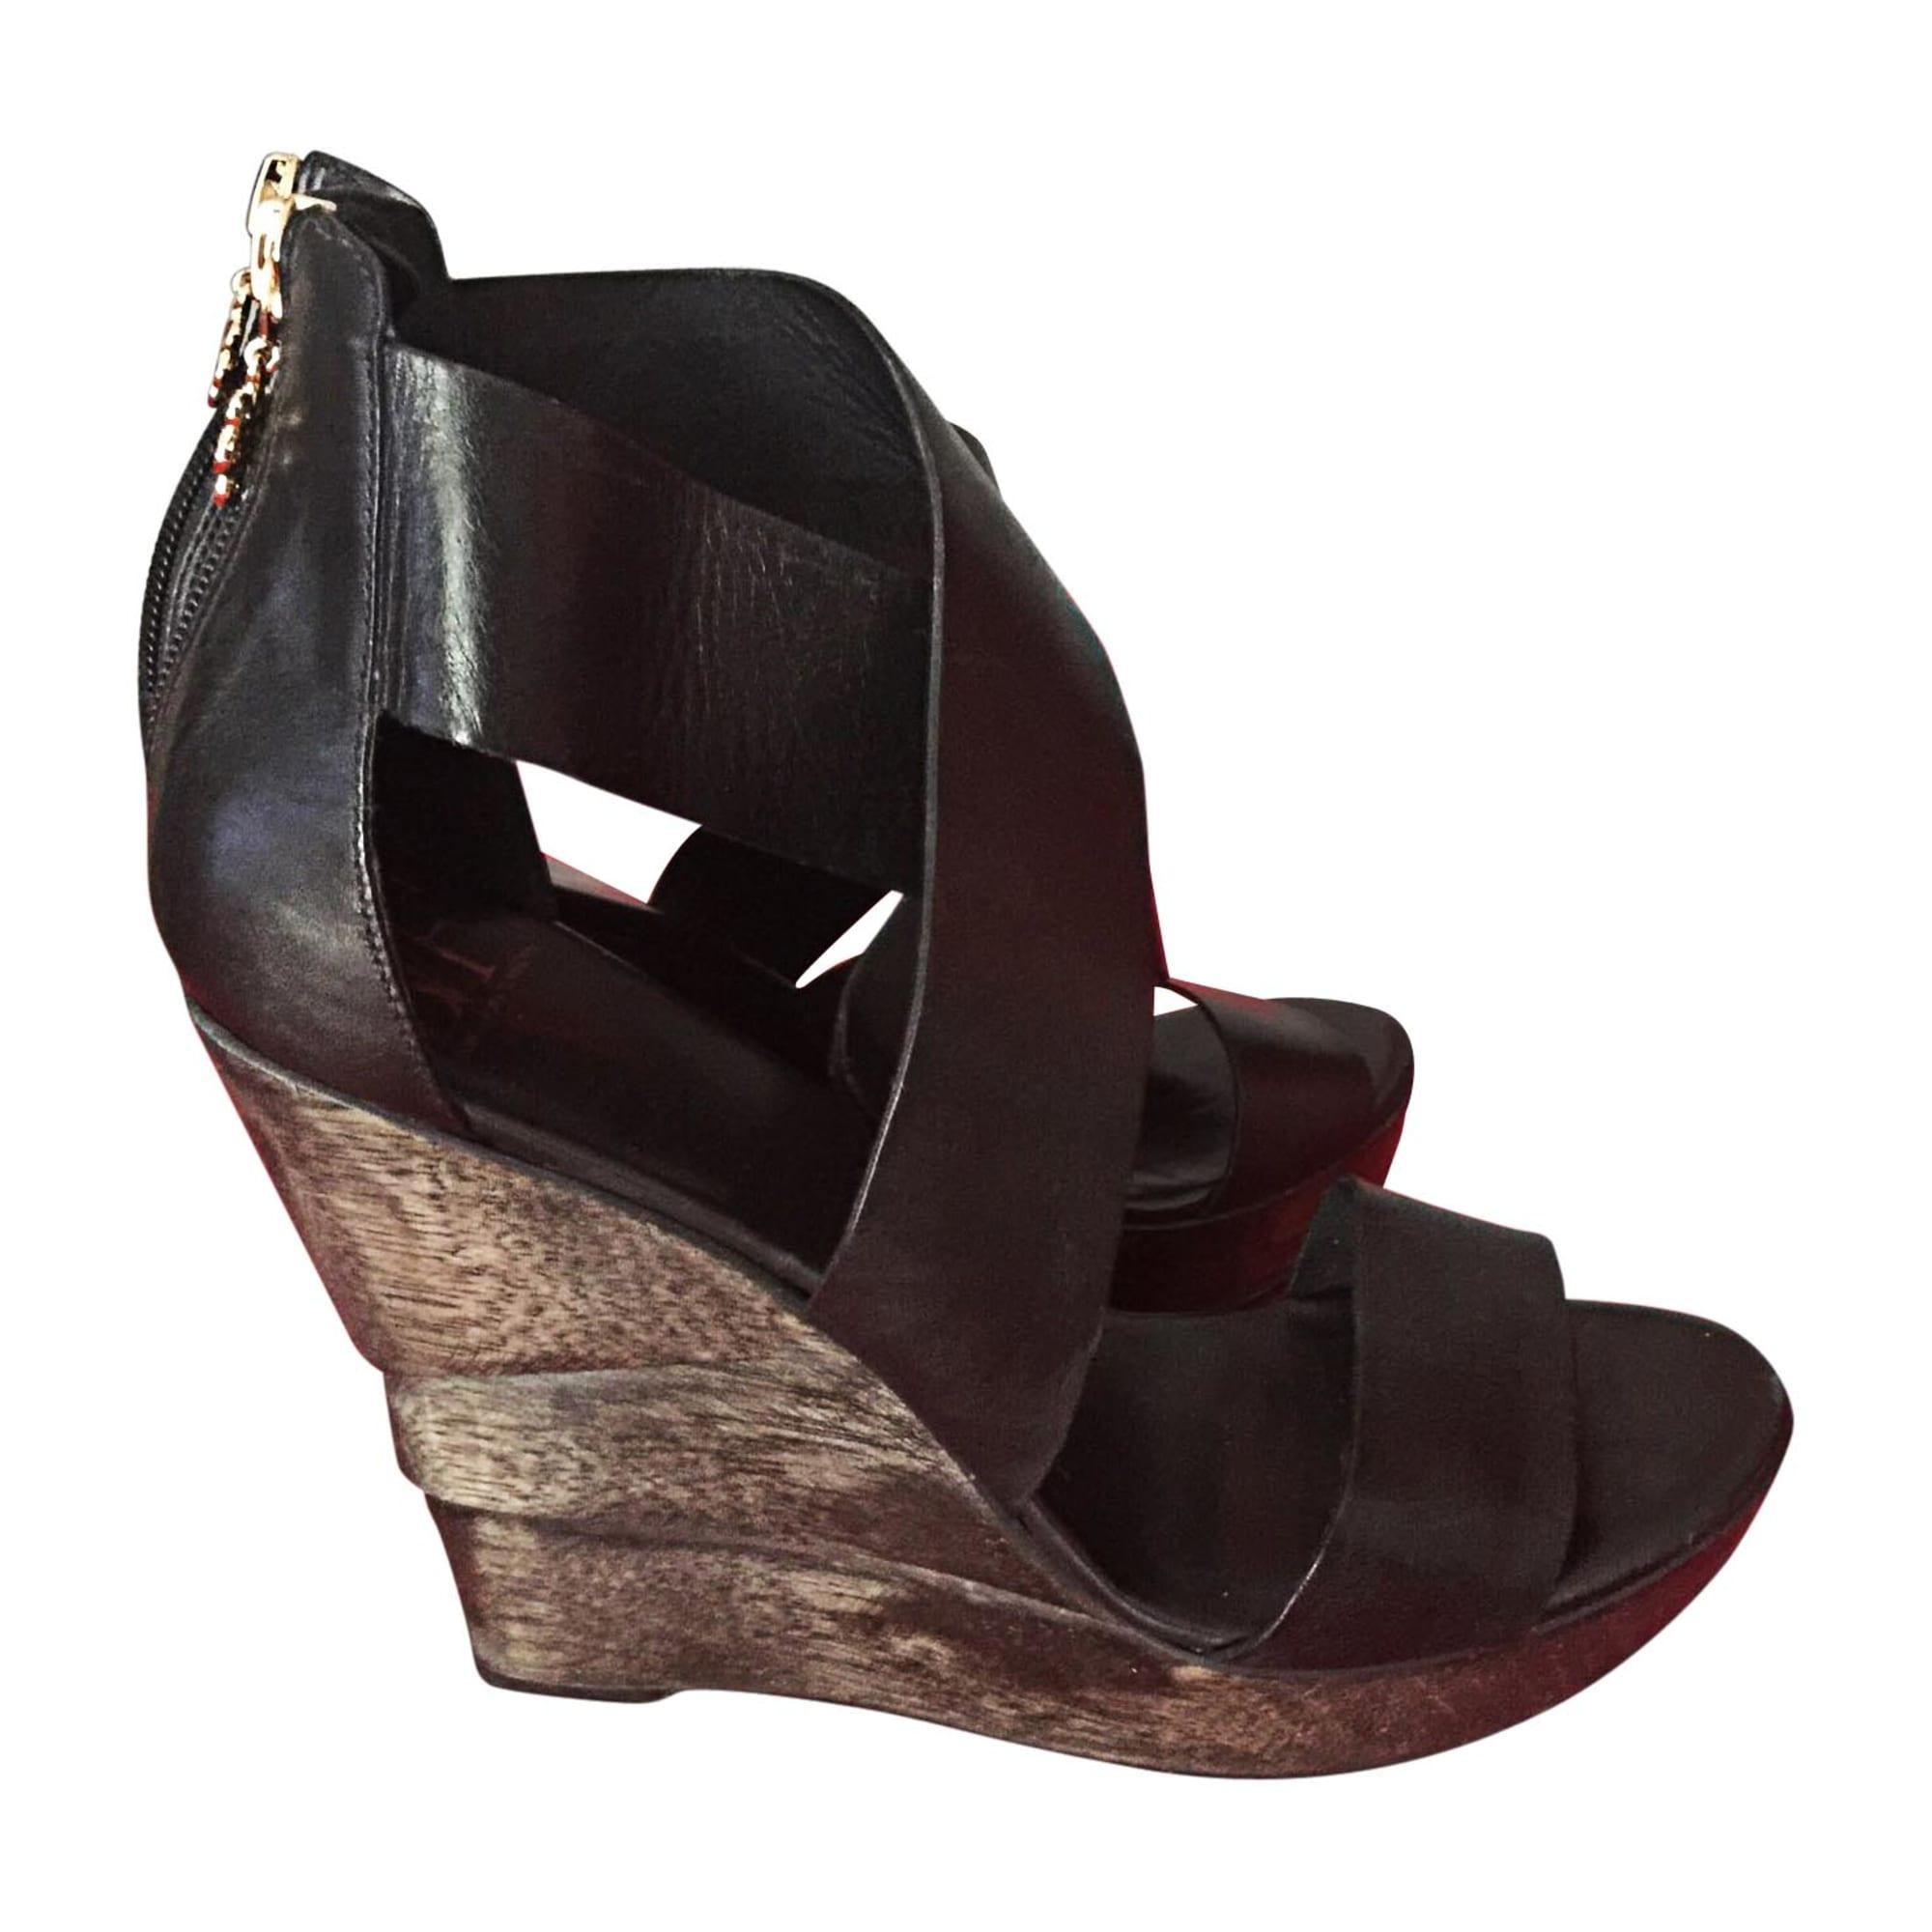 Sandales compensées DIANE VON FURSTENBERG Noir